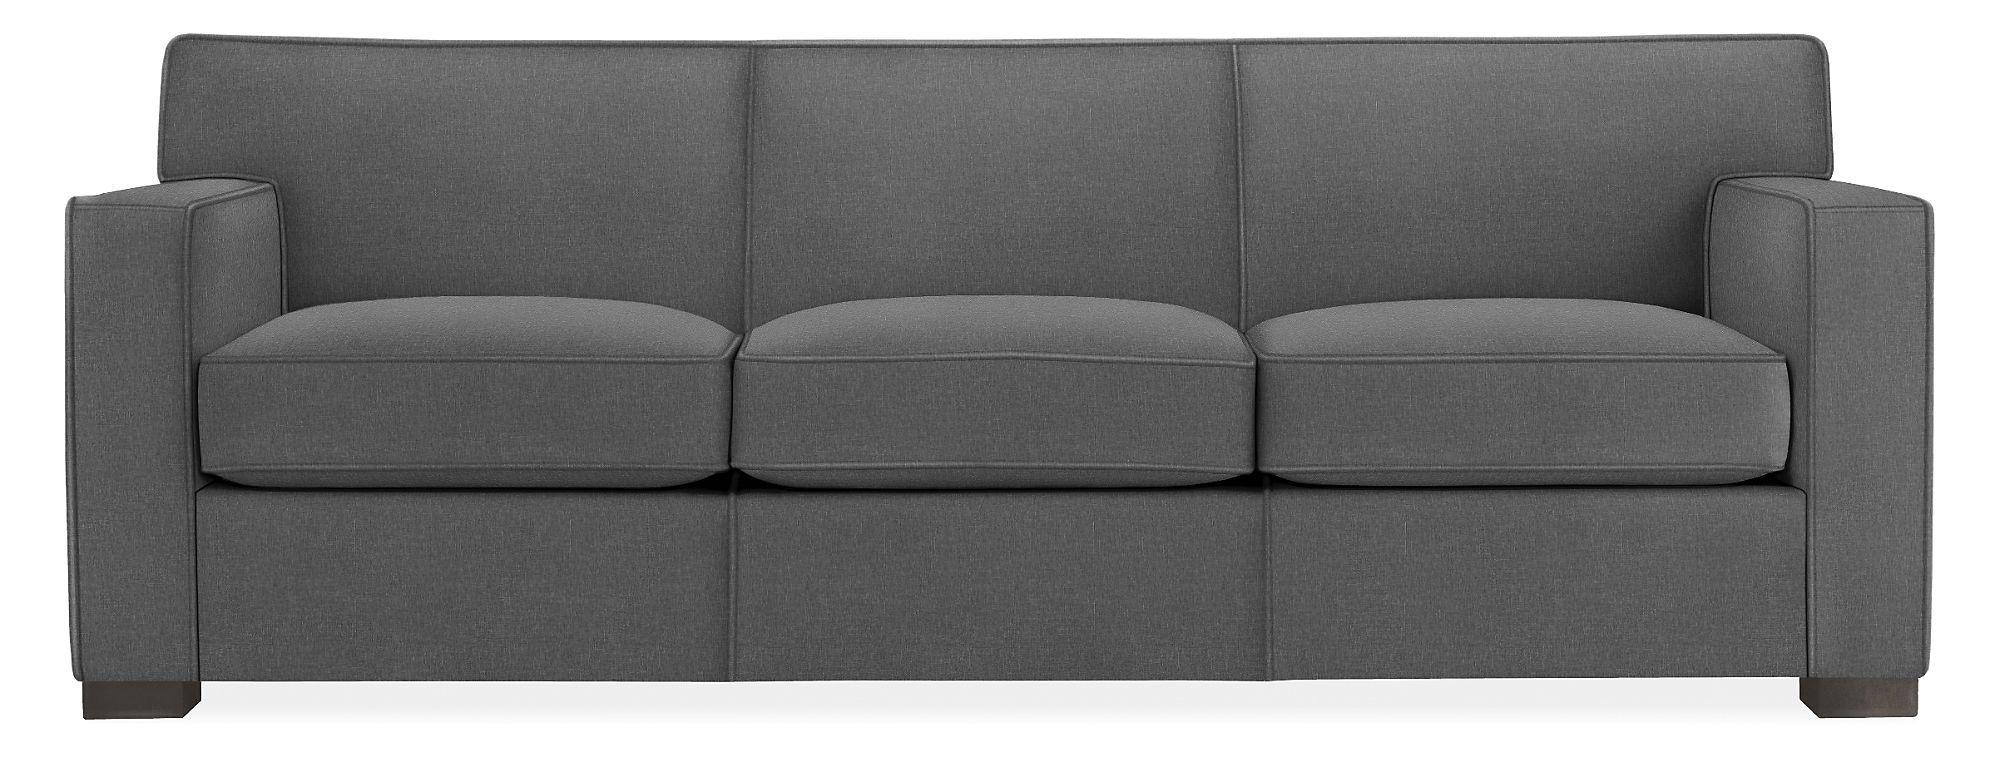 2000 Dean Sofas Living Room Board